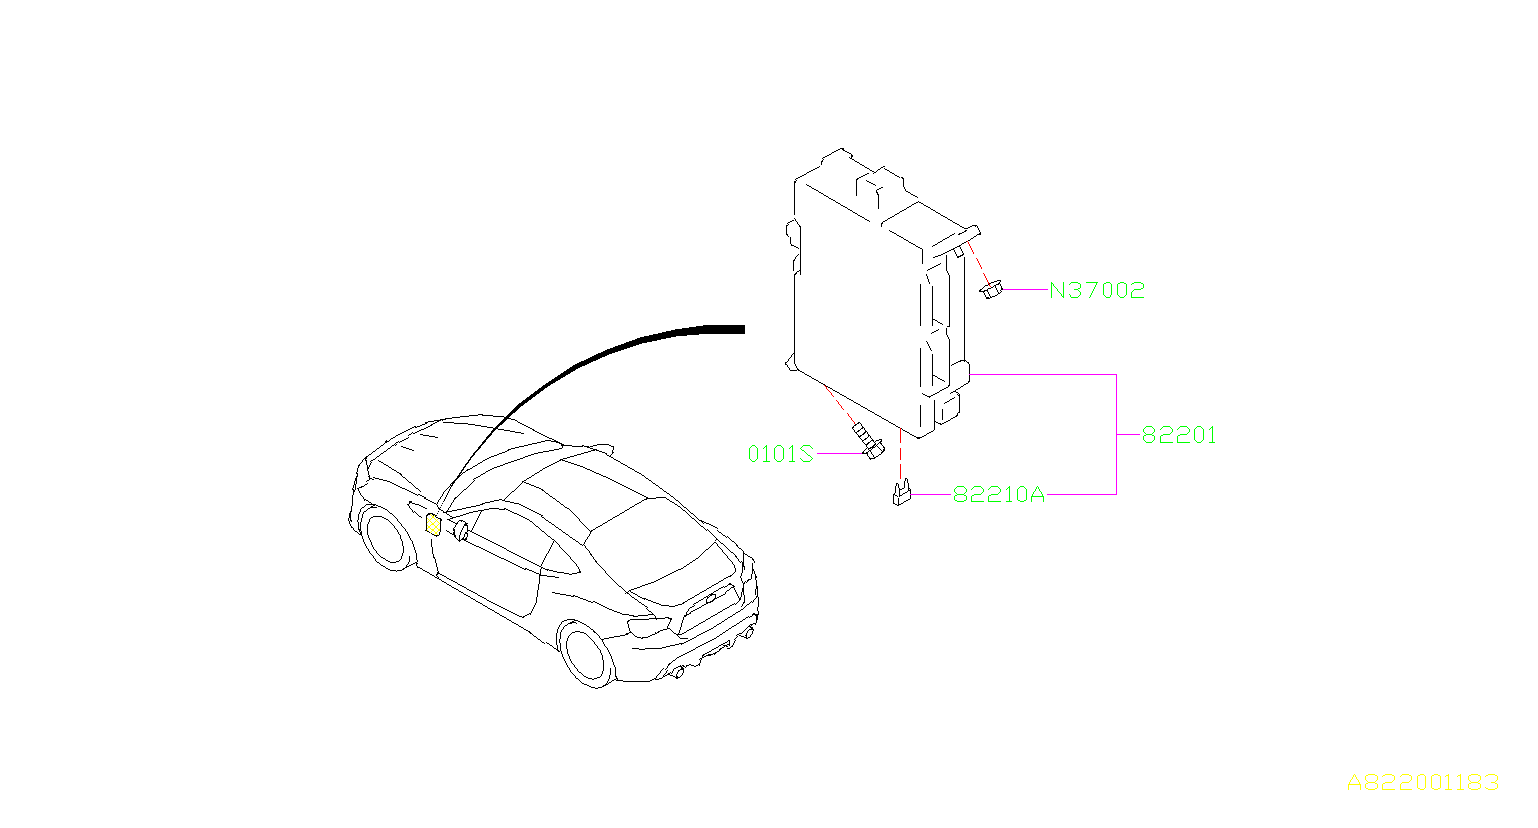 Subaru    BRZ    Fuseauto Box  harness     wiring     82210AJ100